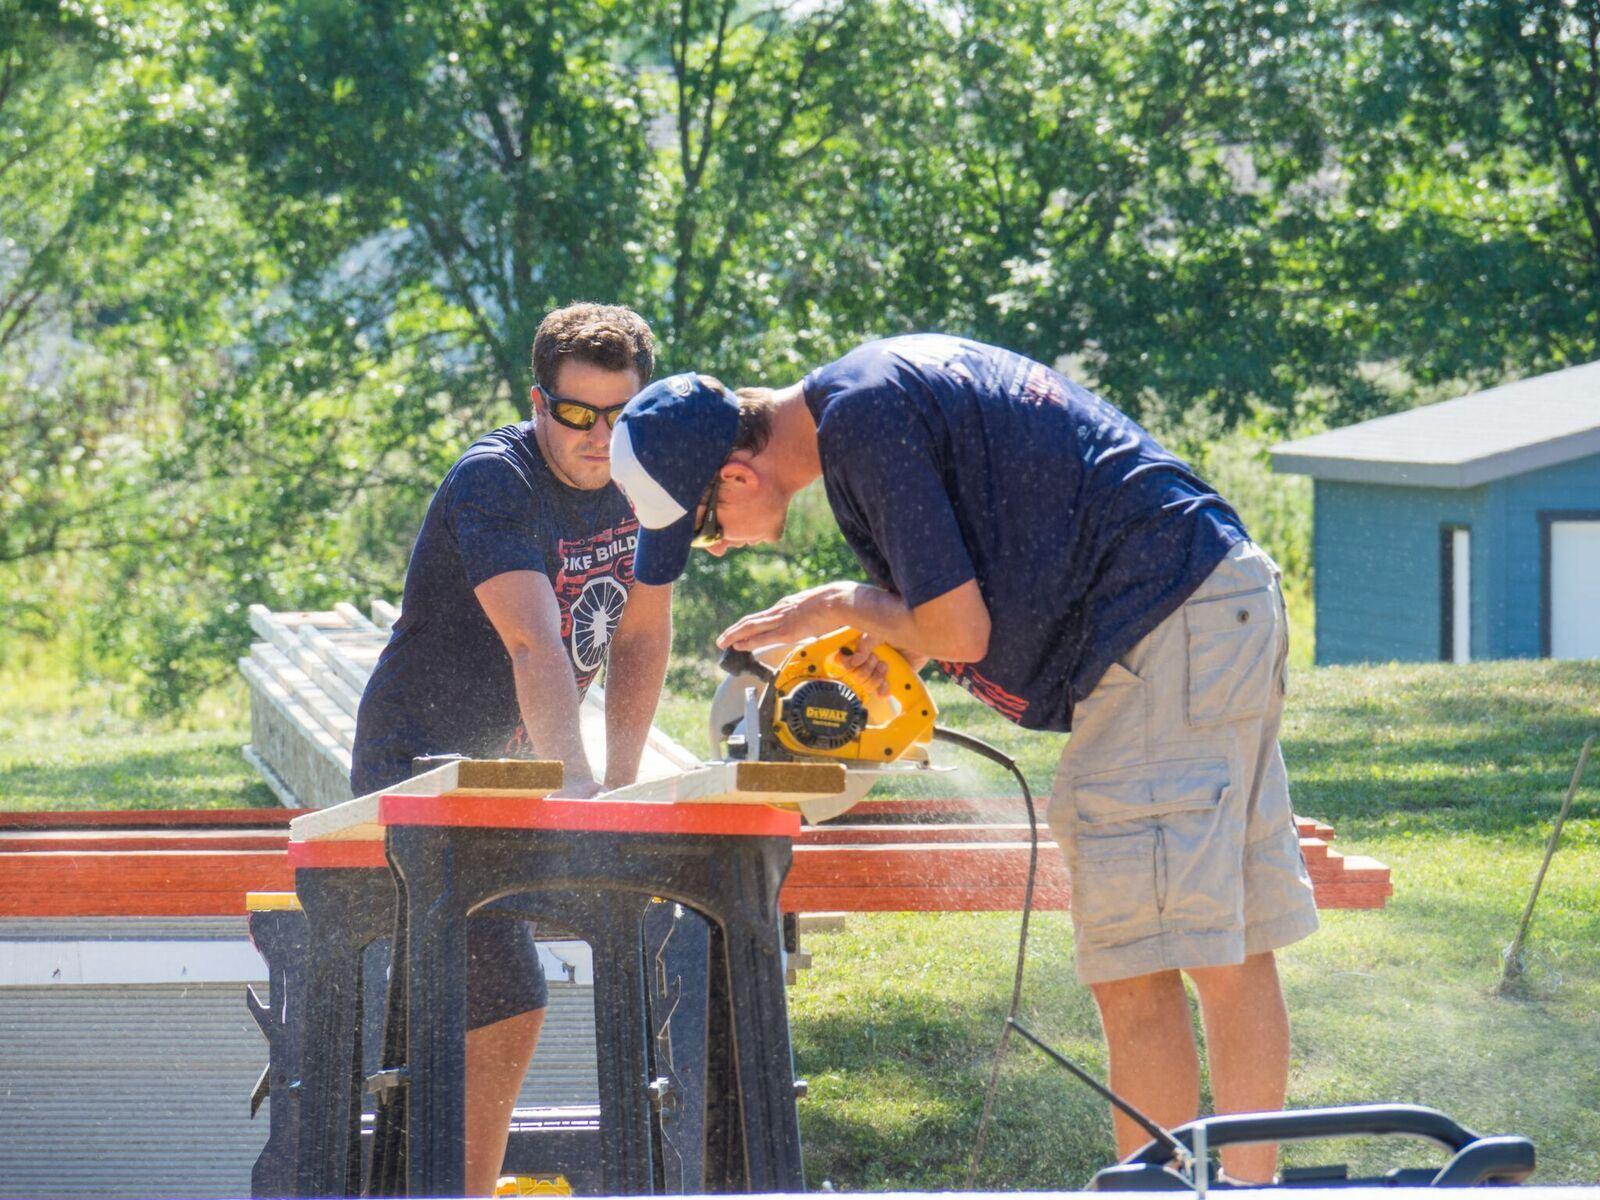 Bike and Build Miter Saw